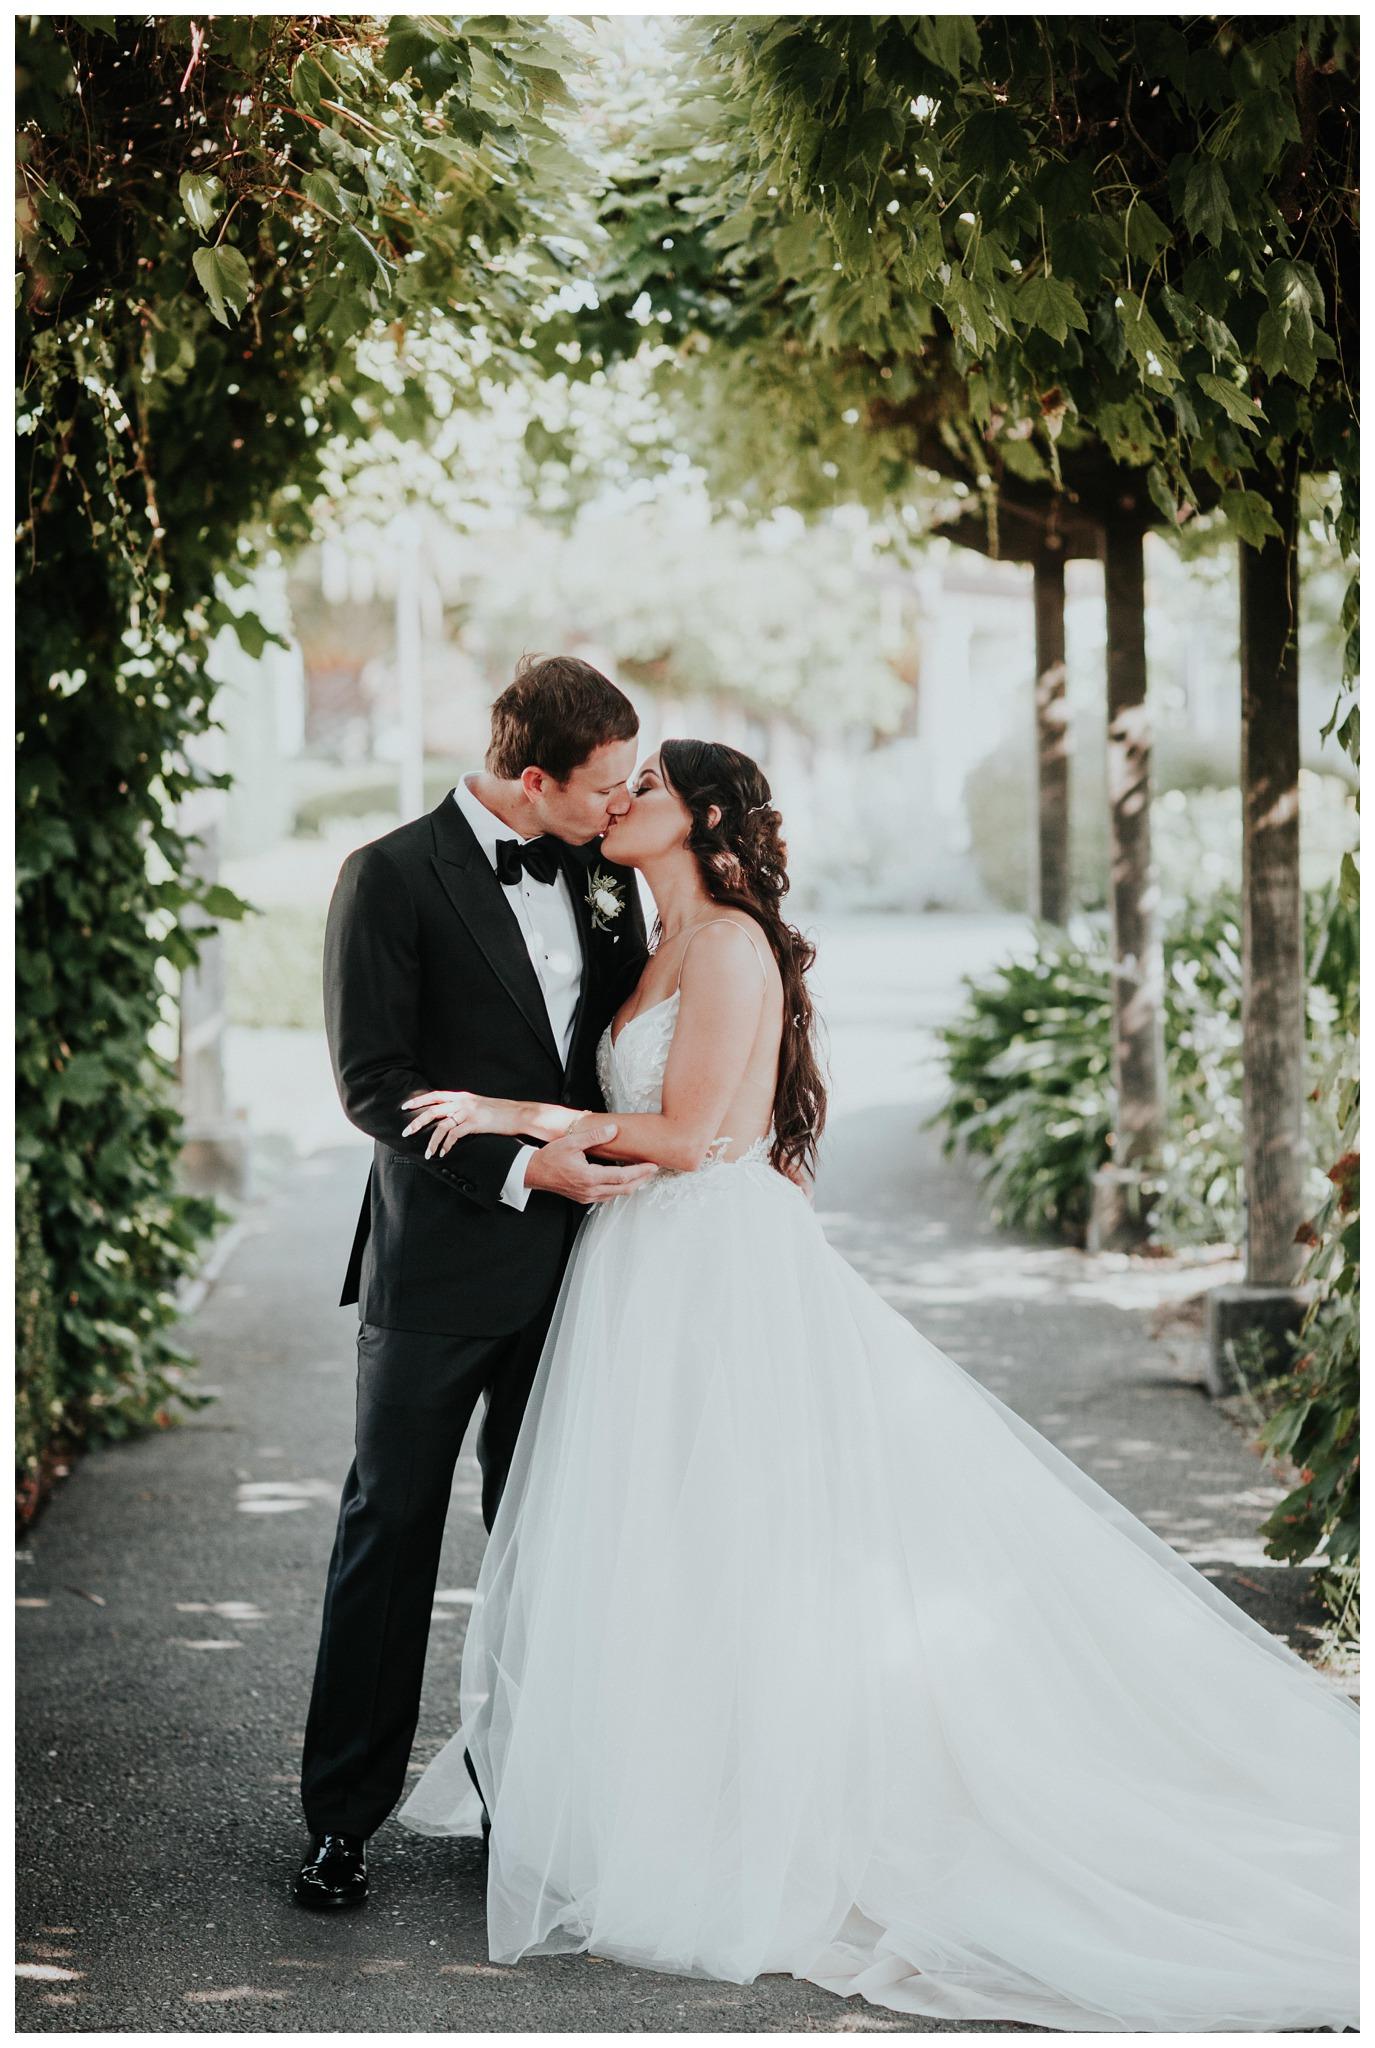 The Vintage Estates - Napa Valley - Yountville CA - Madeleine Frost Weddings-2018.jpg